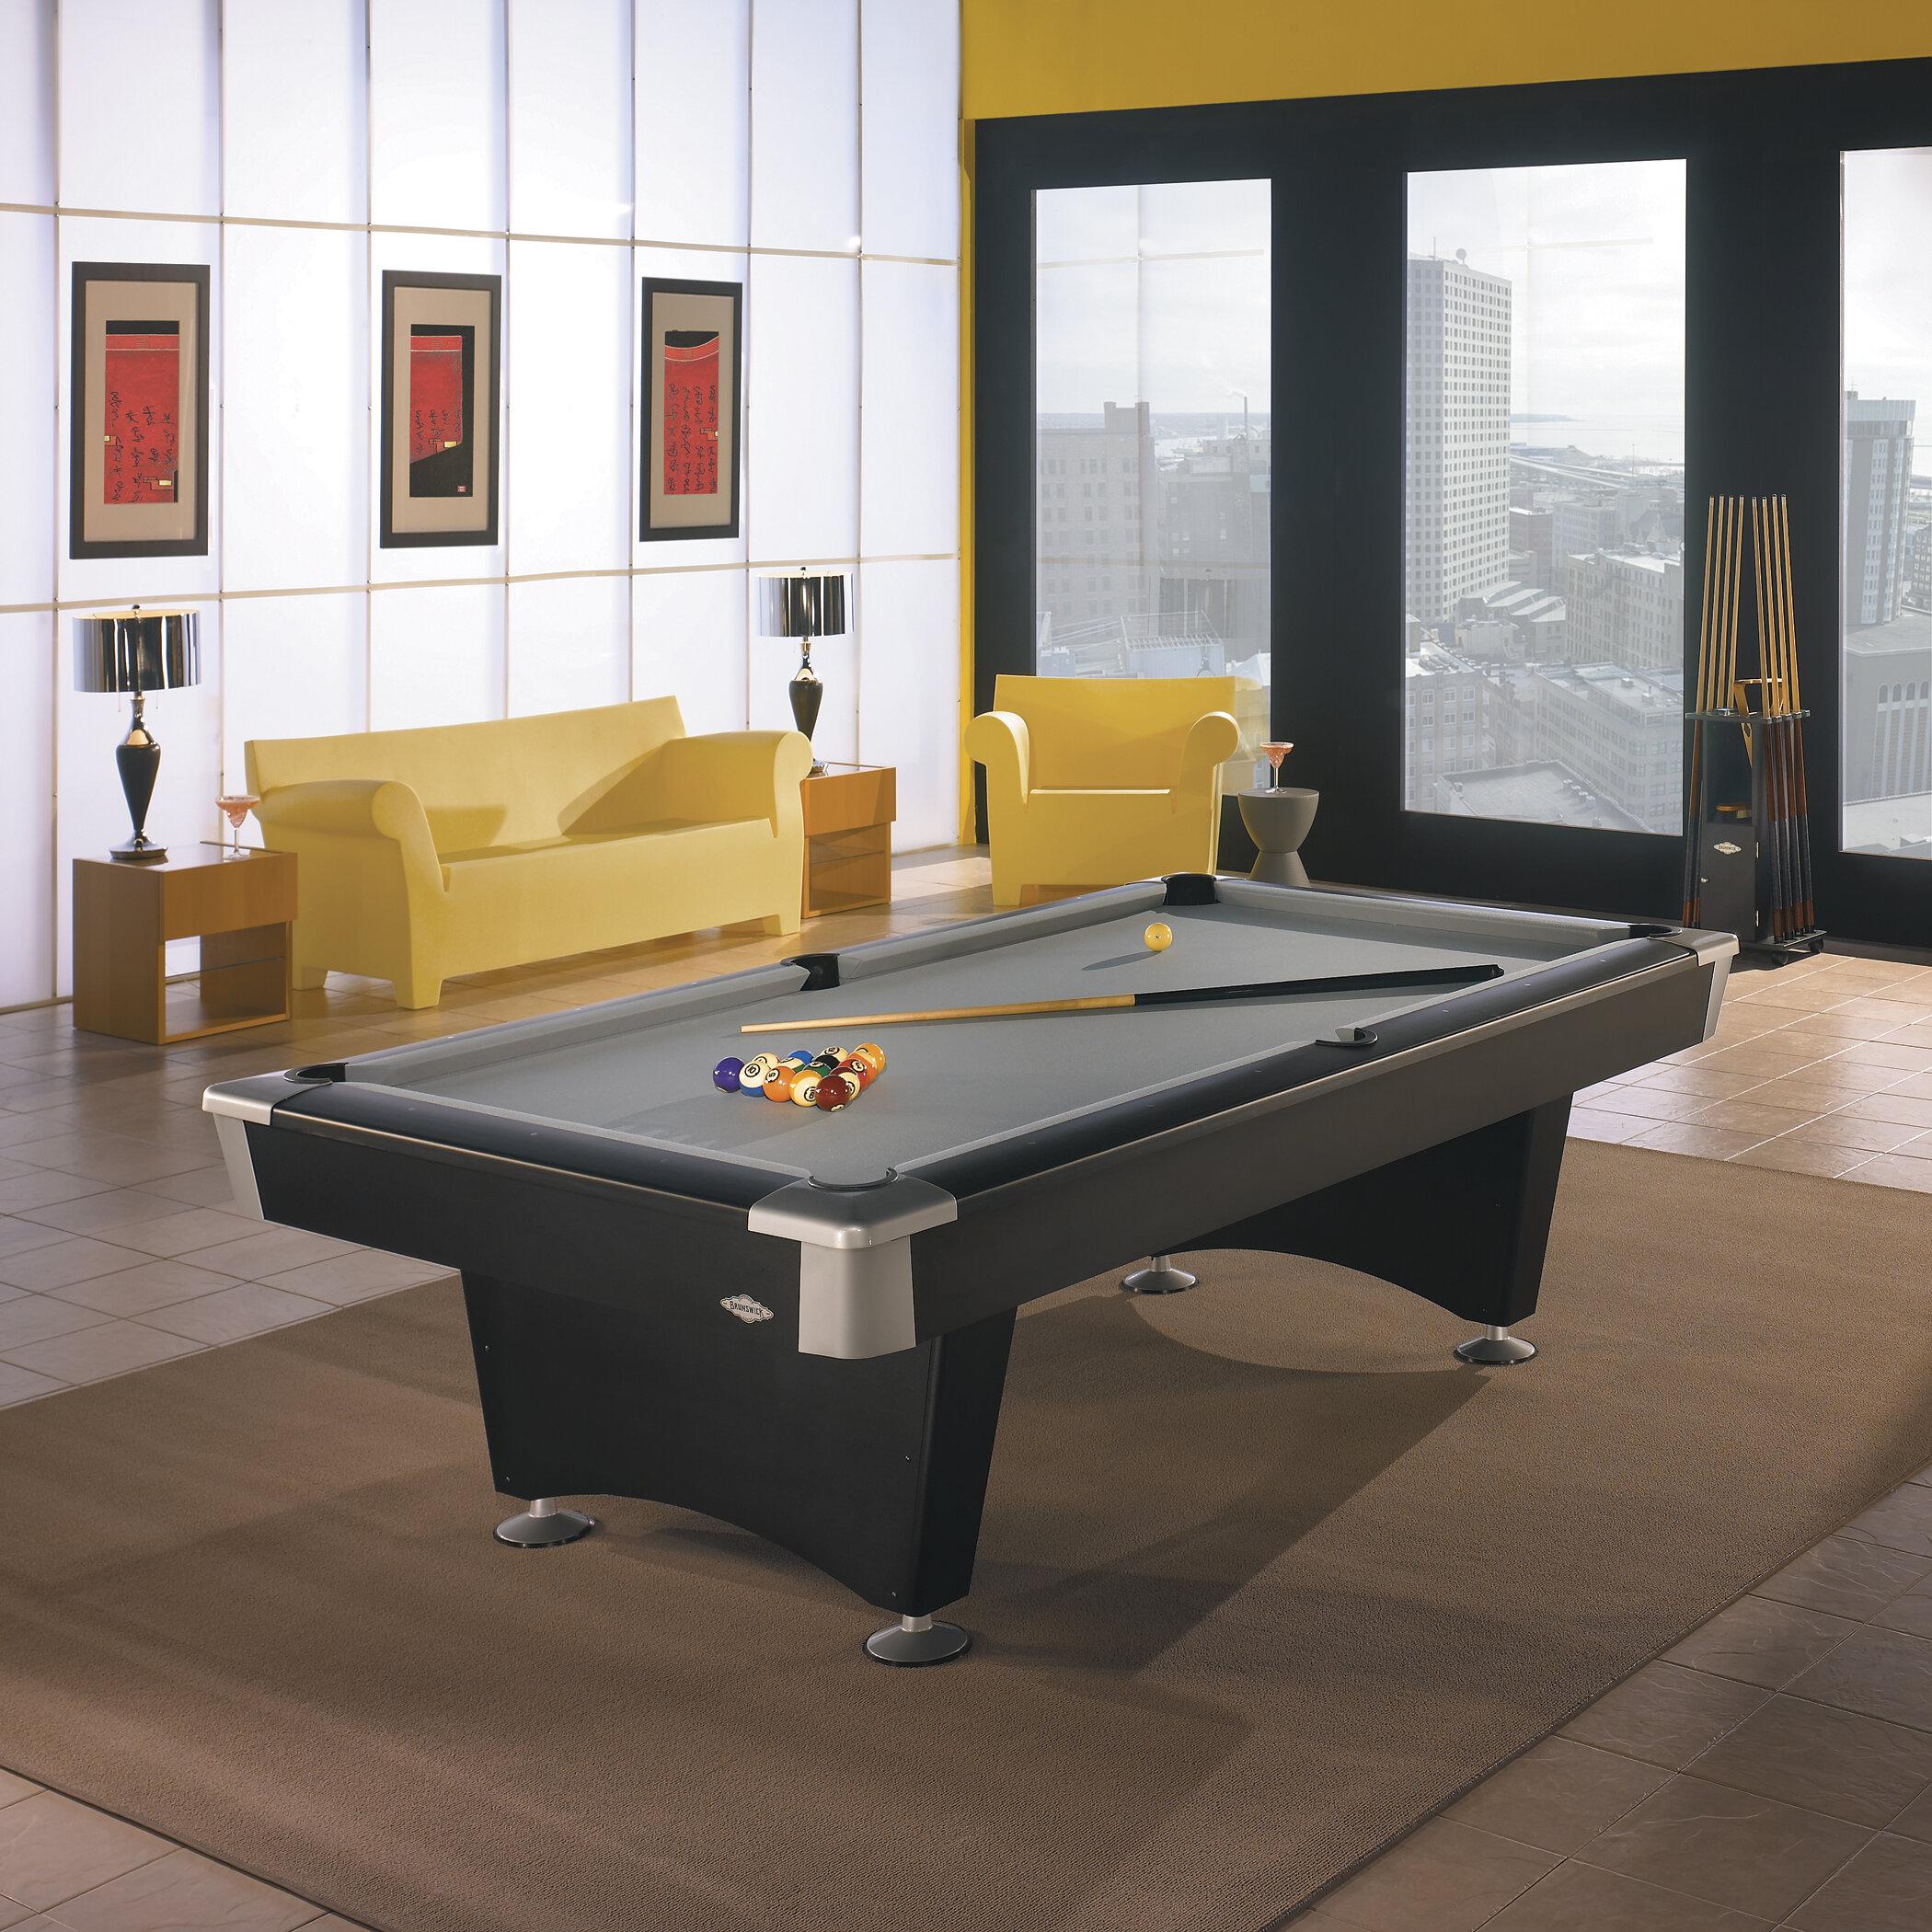 Brunswick Billiards Boca Billiards 8\u0027 Pool Table U0026 Reviews | Wayfair. Brunswick  Billiards Boca Billiards 8 Pool Table Reviews Wayfair